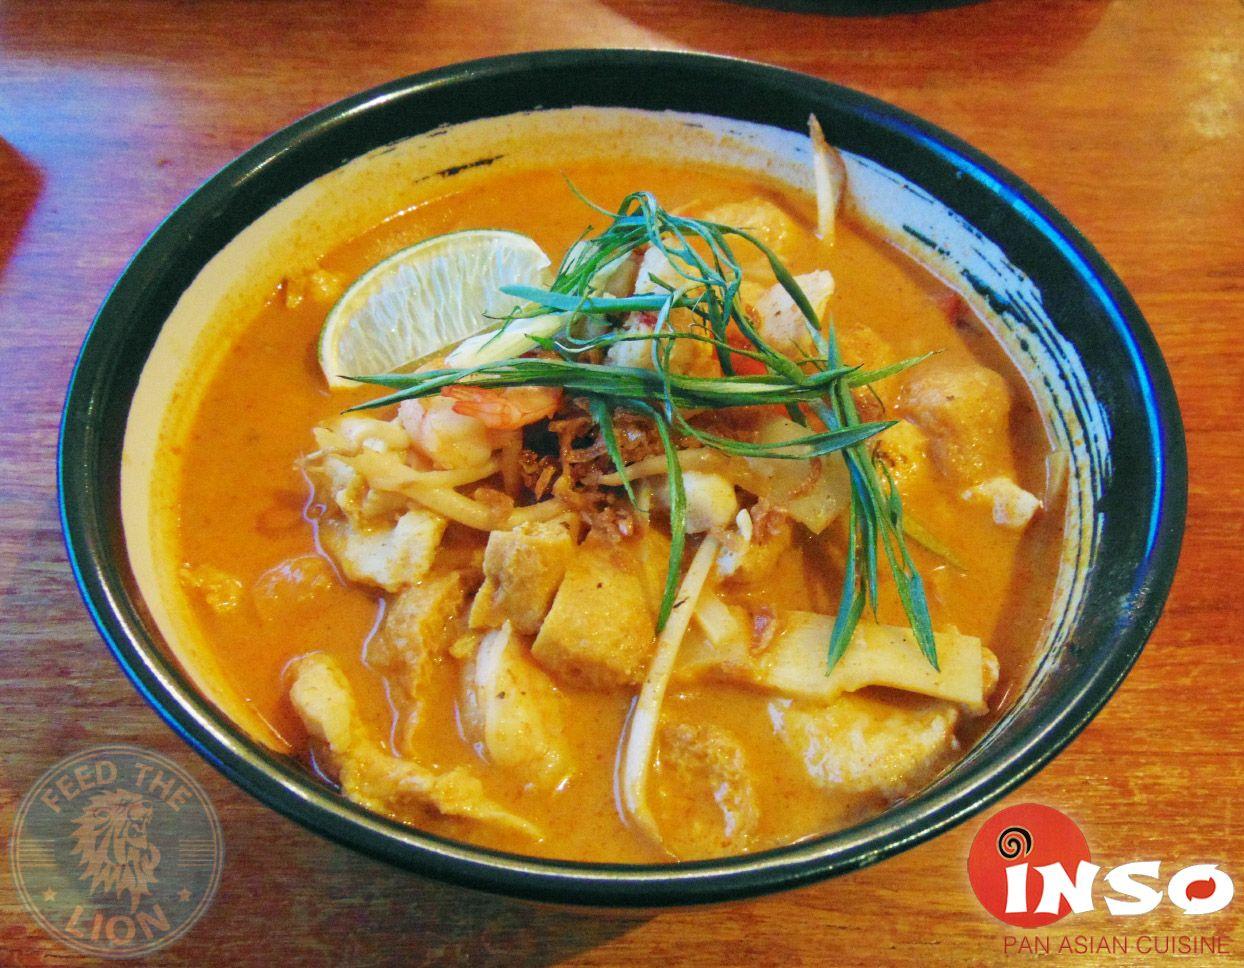 Inso Pan Asian Northwood Halal Recipes Food Food Reviews